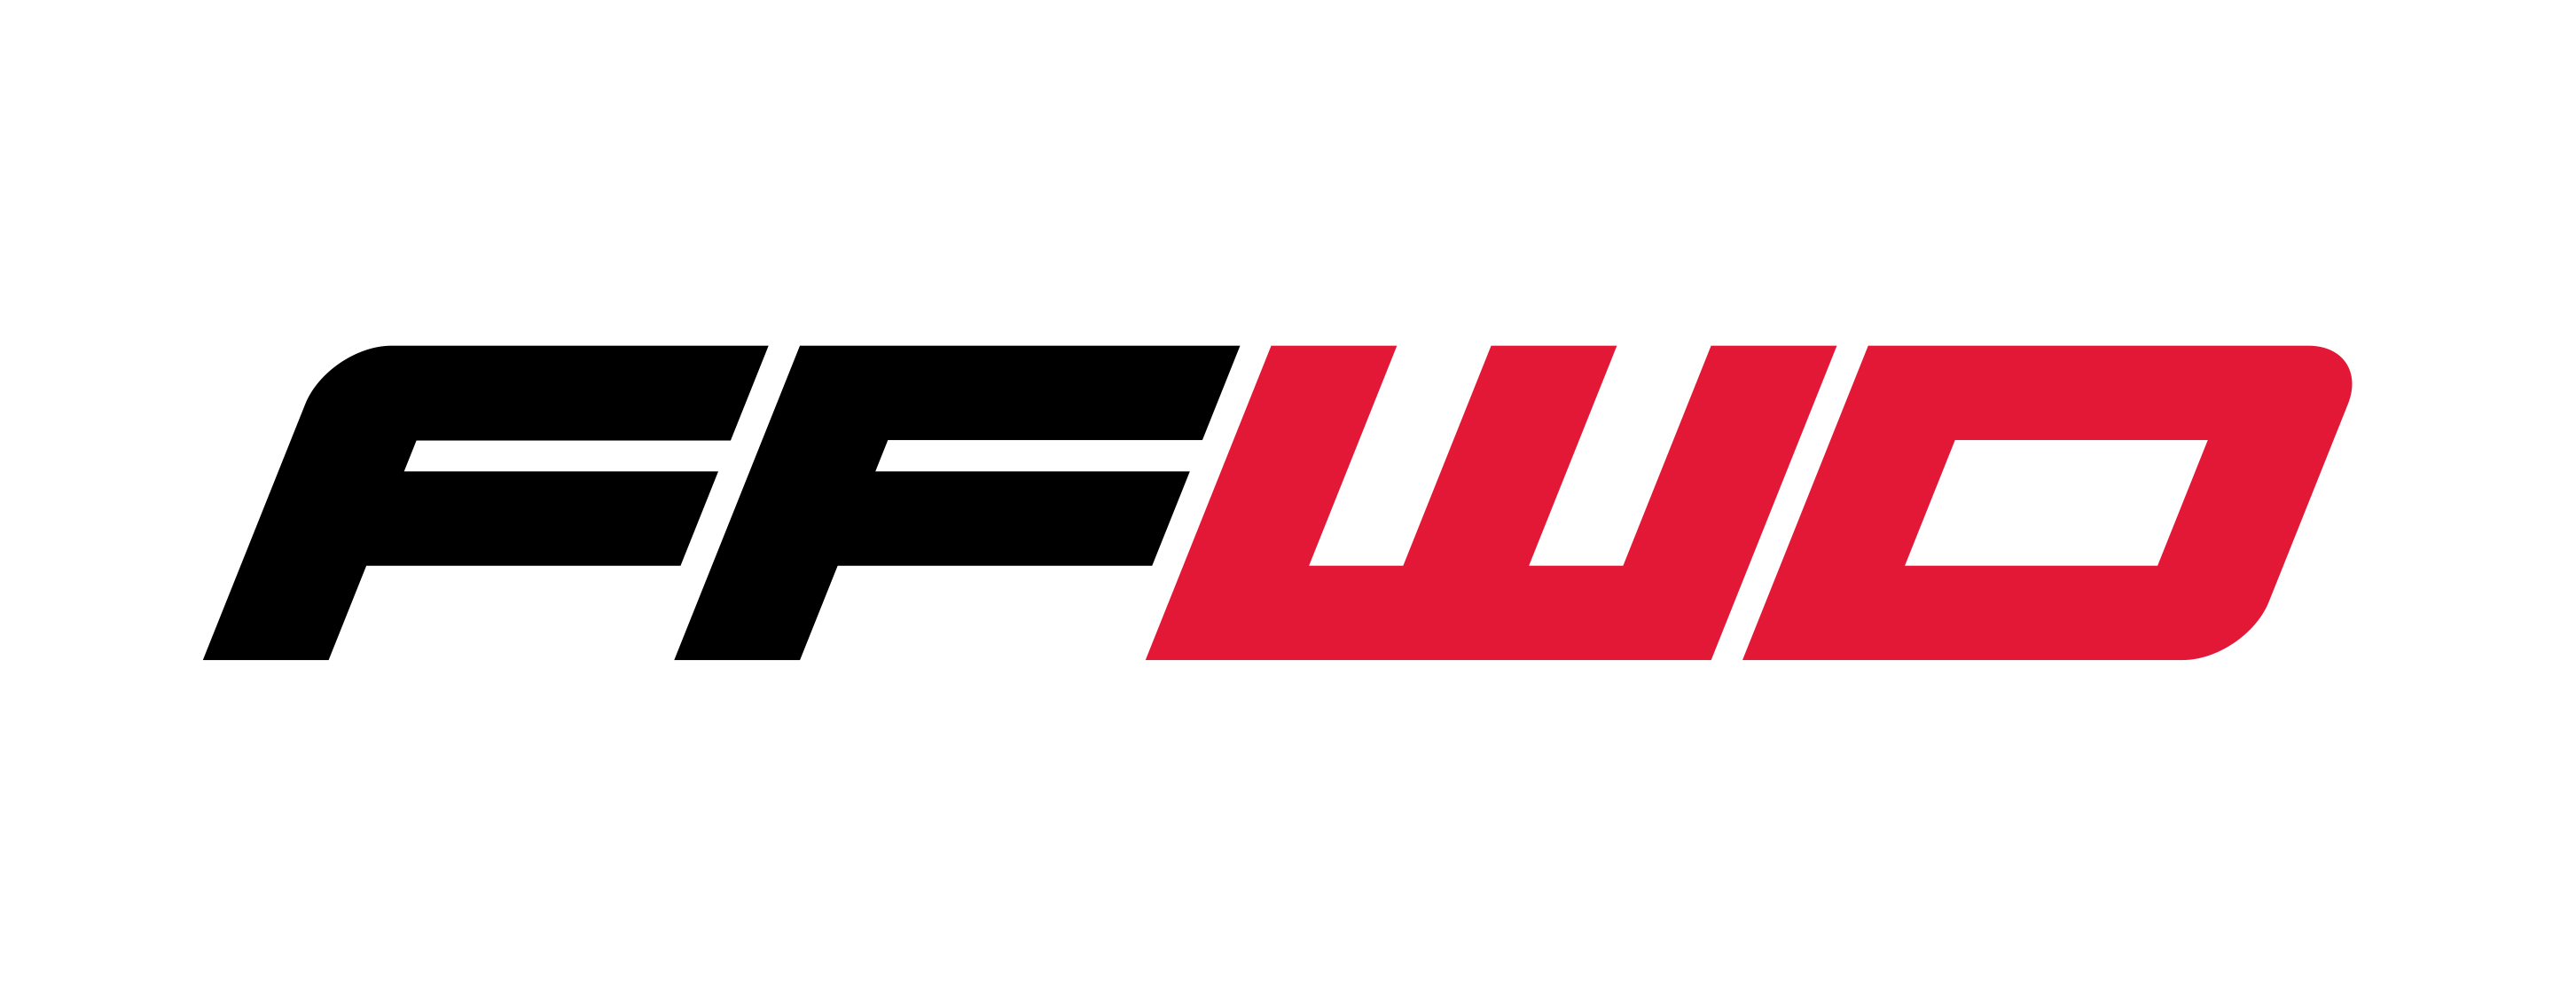 268210 fastforward logo rgb 176918 original 1513610771